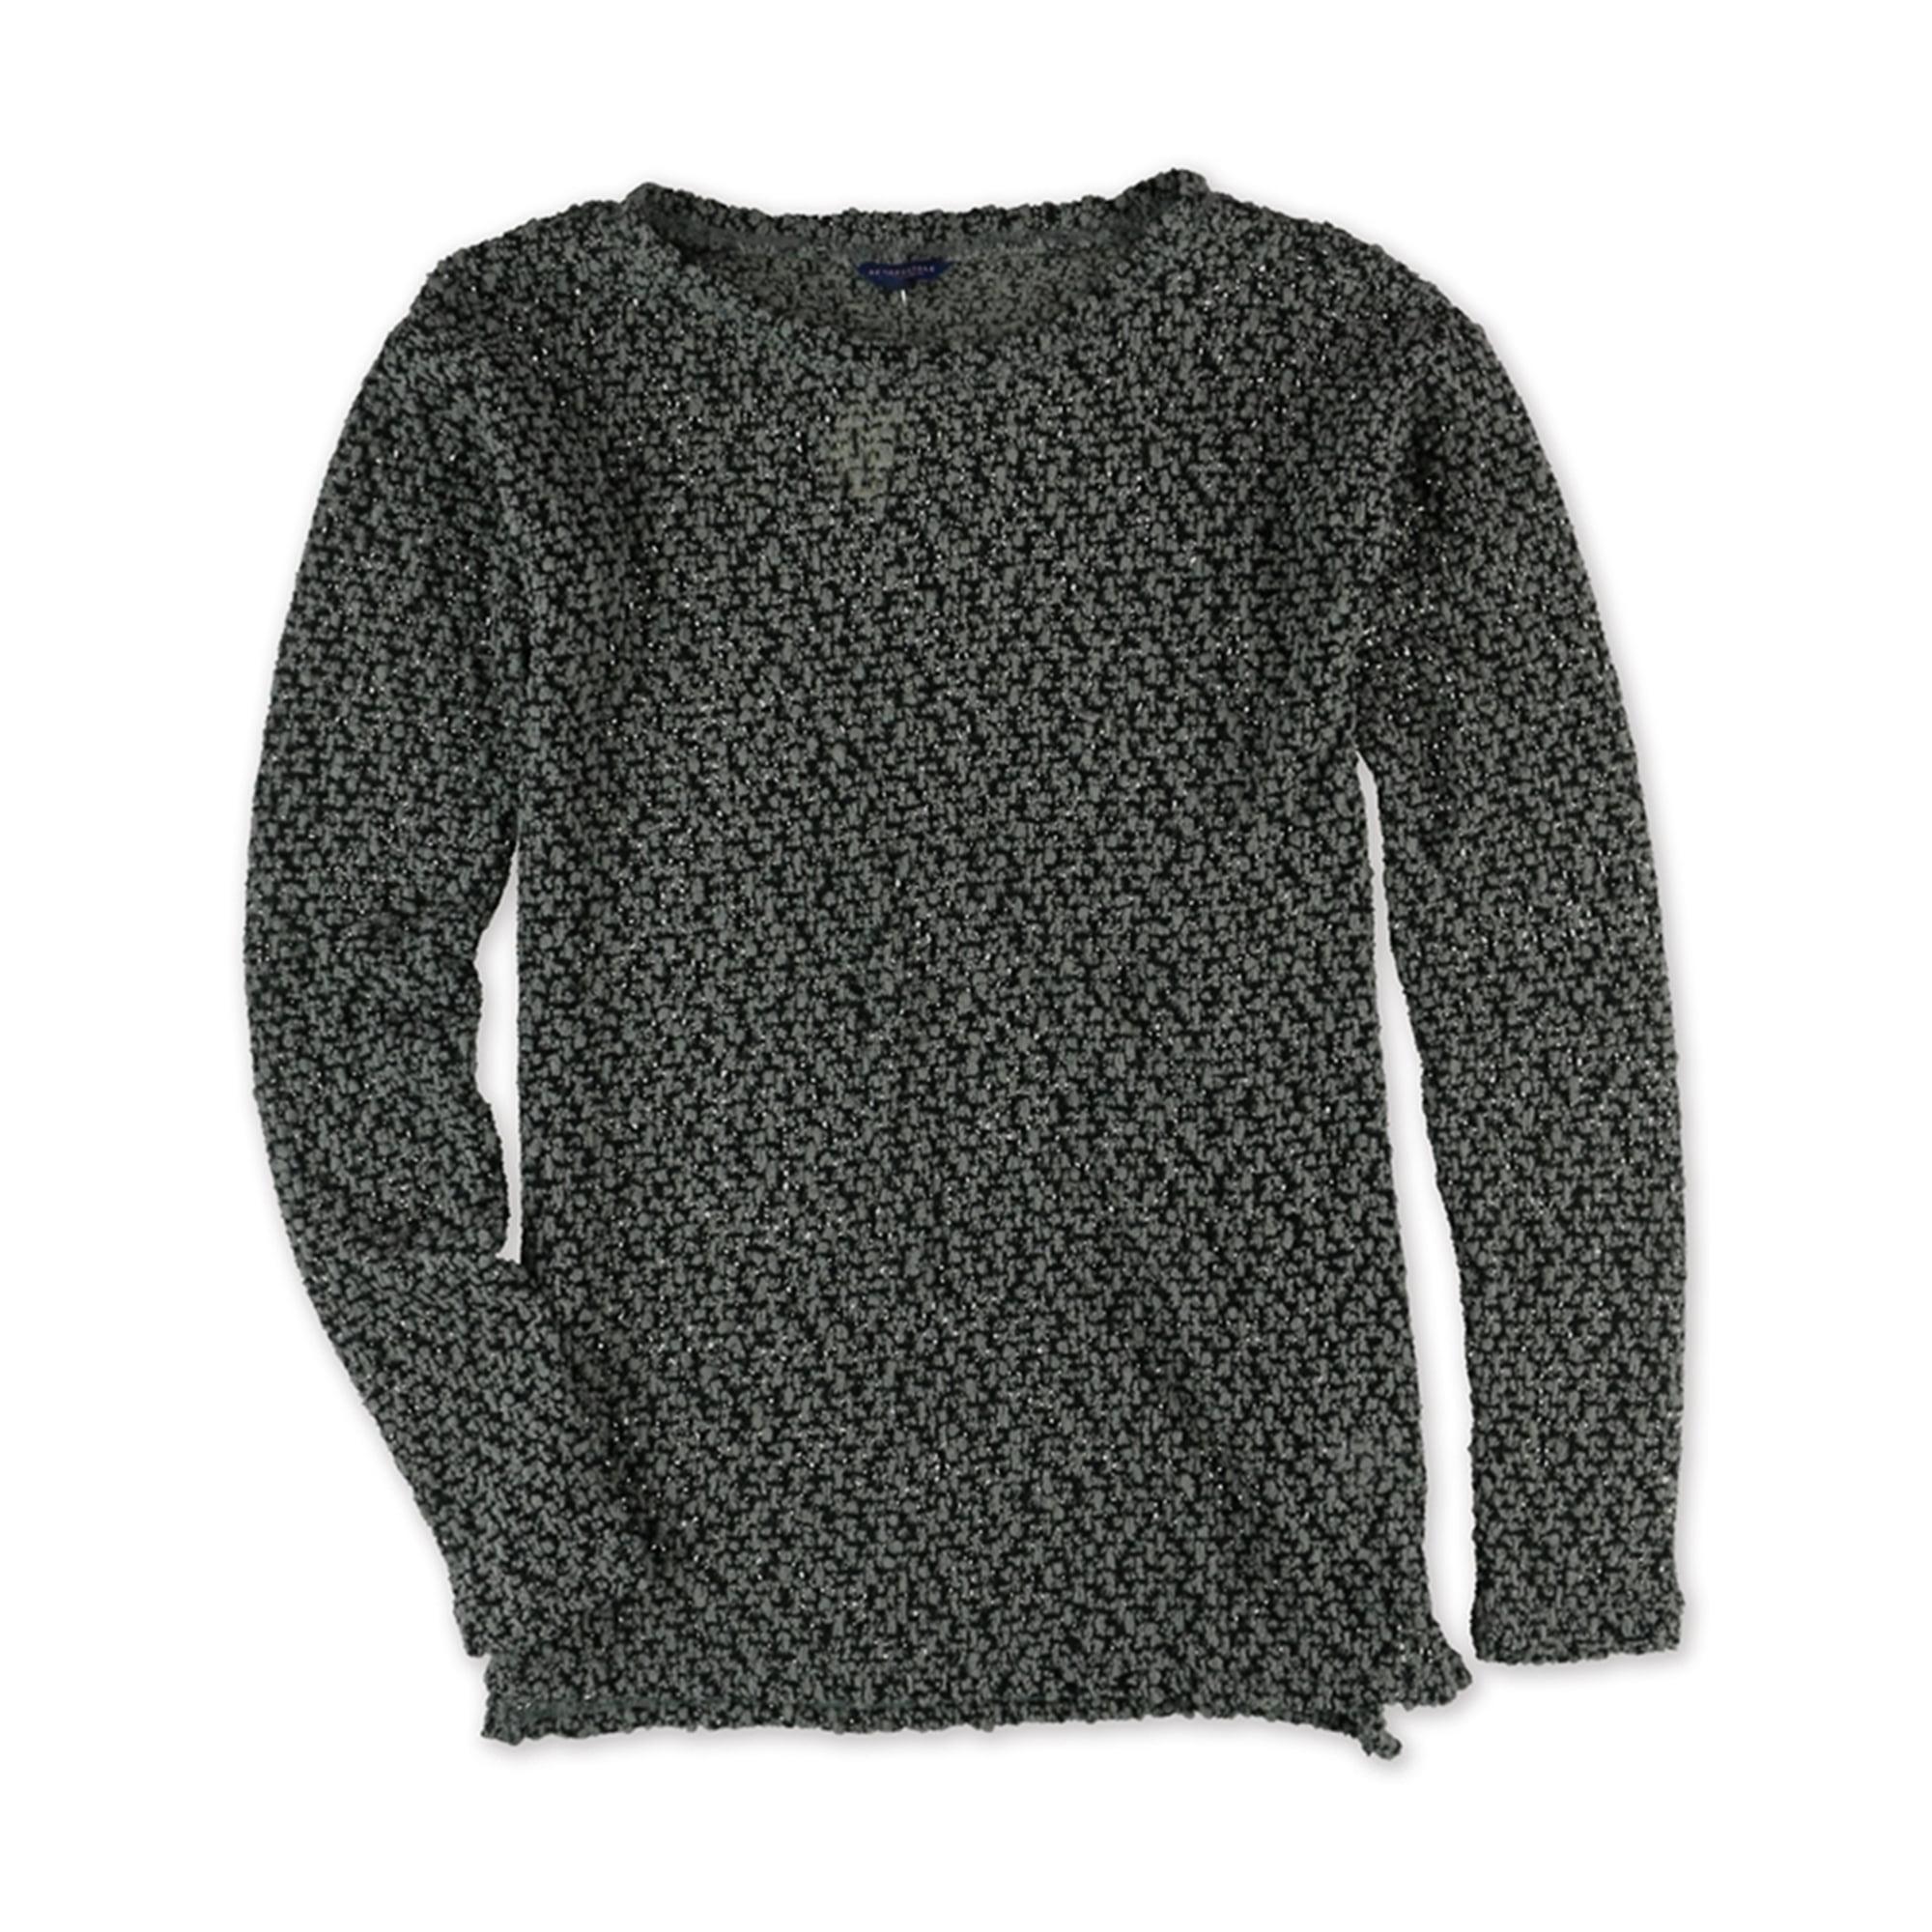 Aeropostale Womens Sheer Knit Sweater